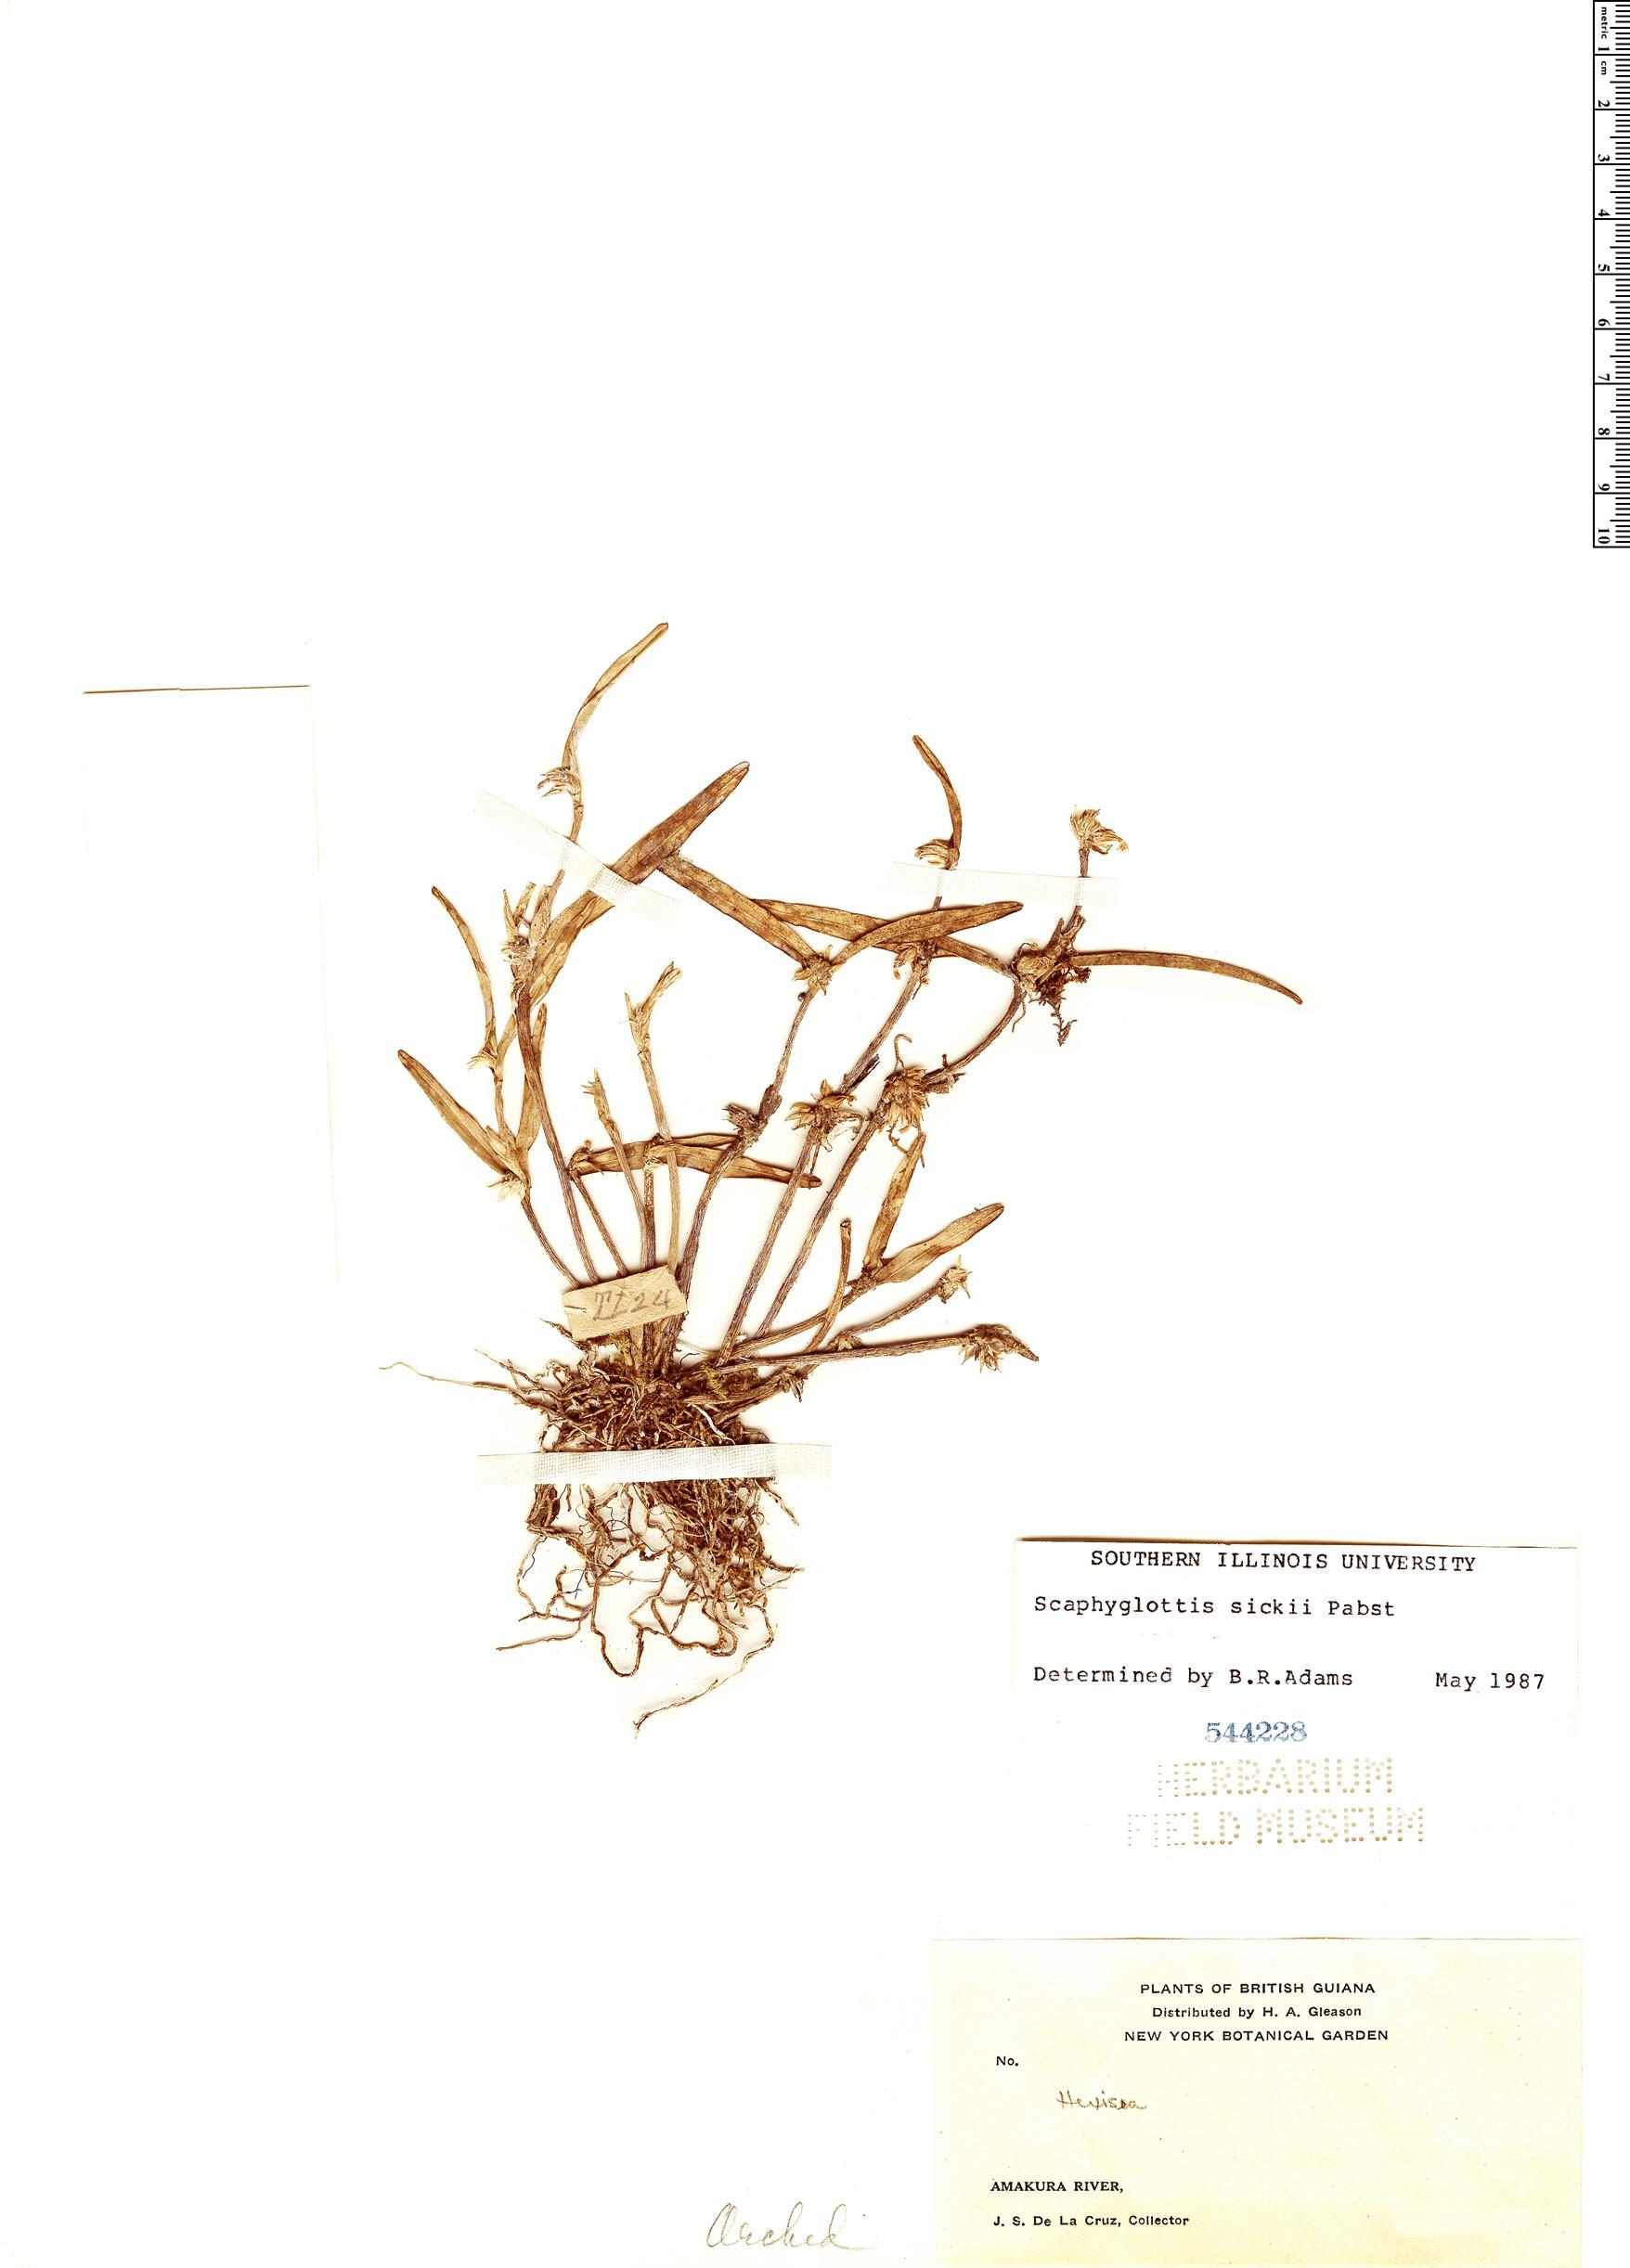 Specimen: Scaphyglottis sickii